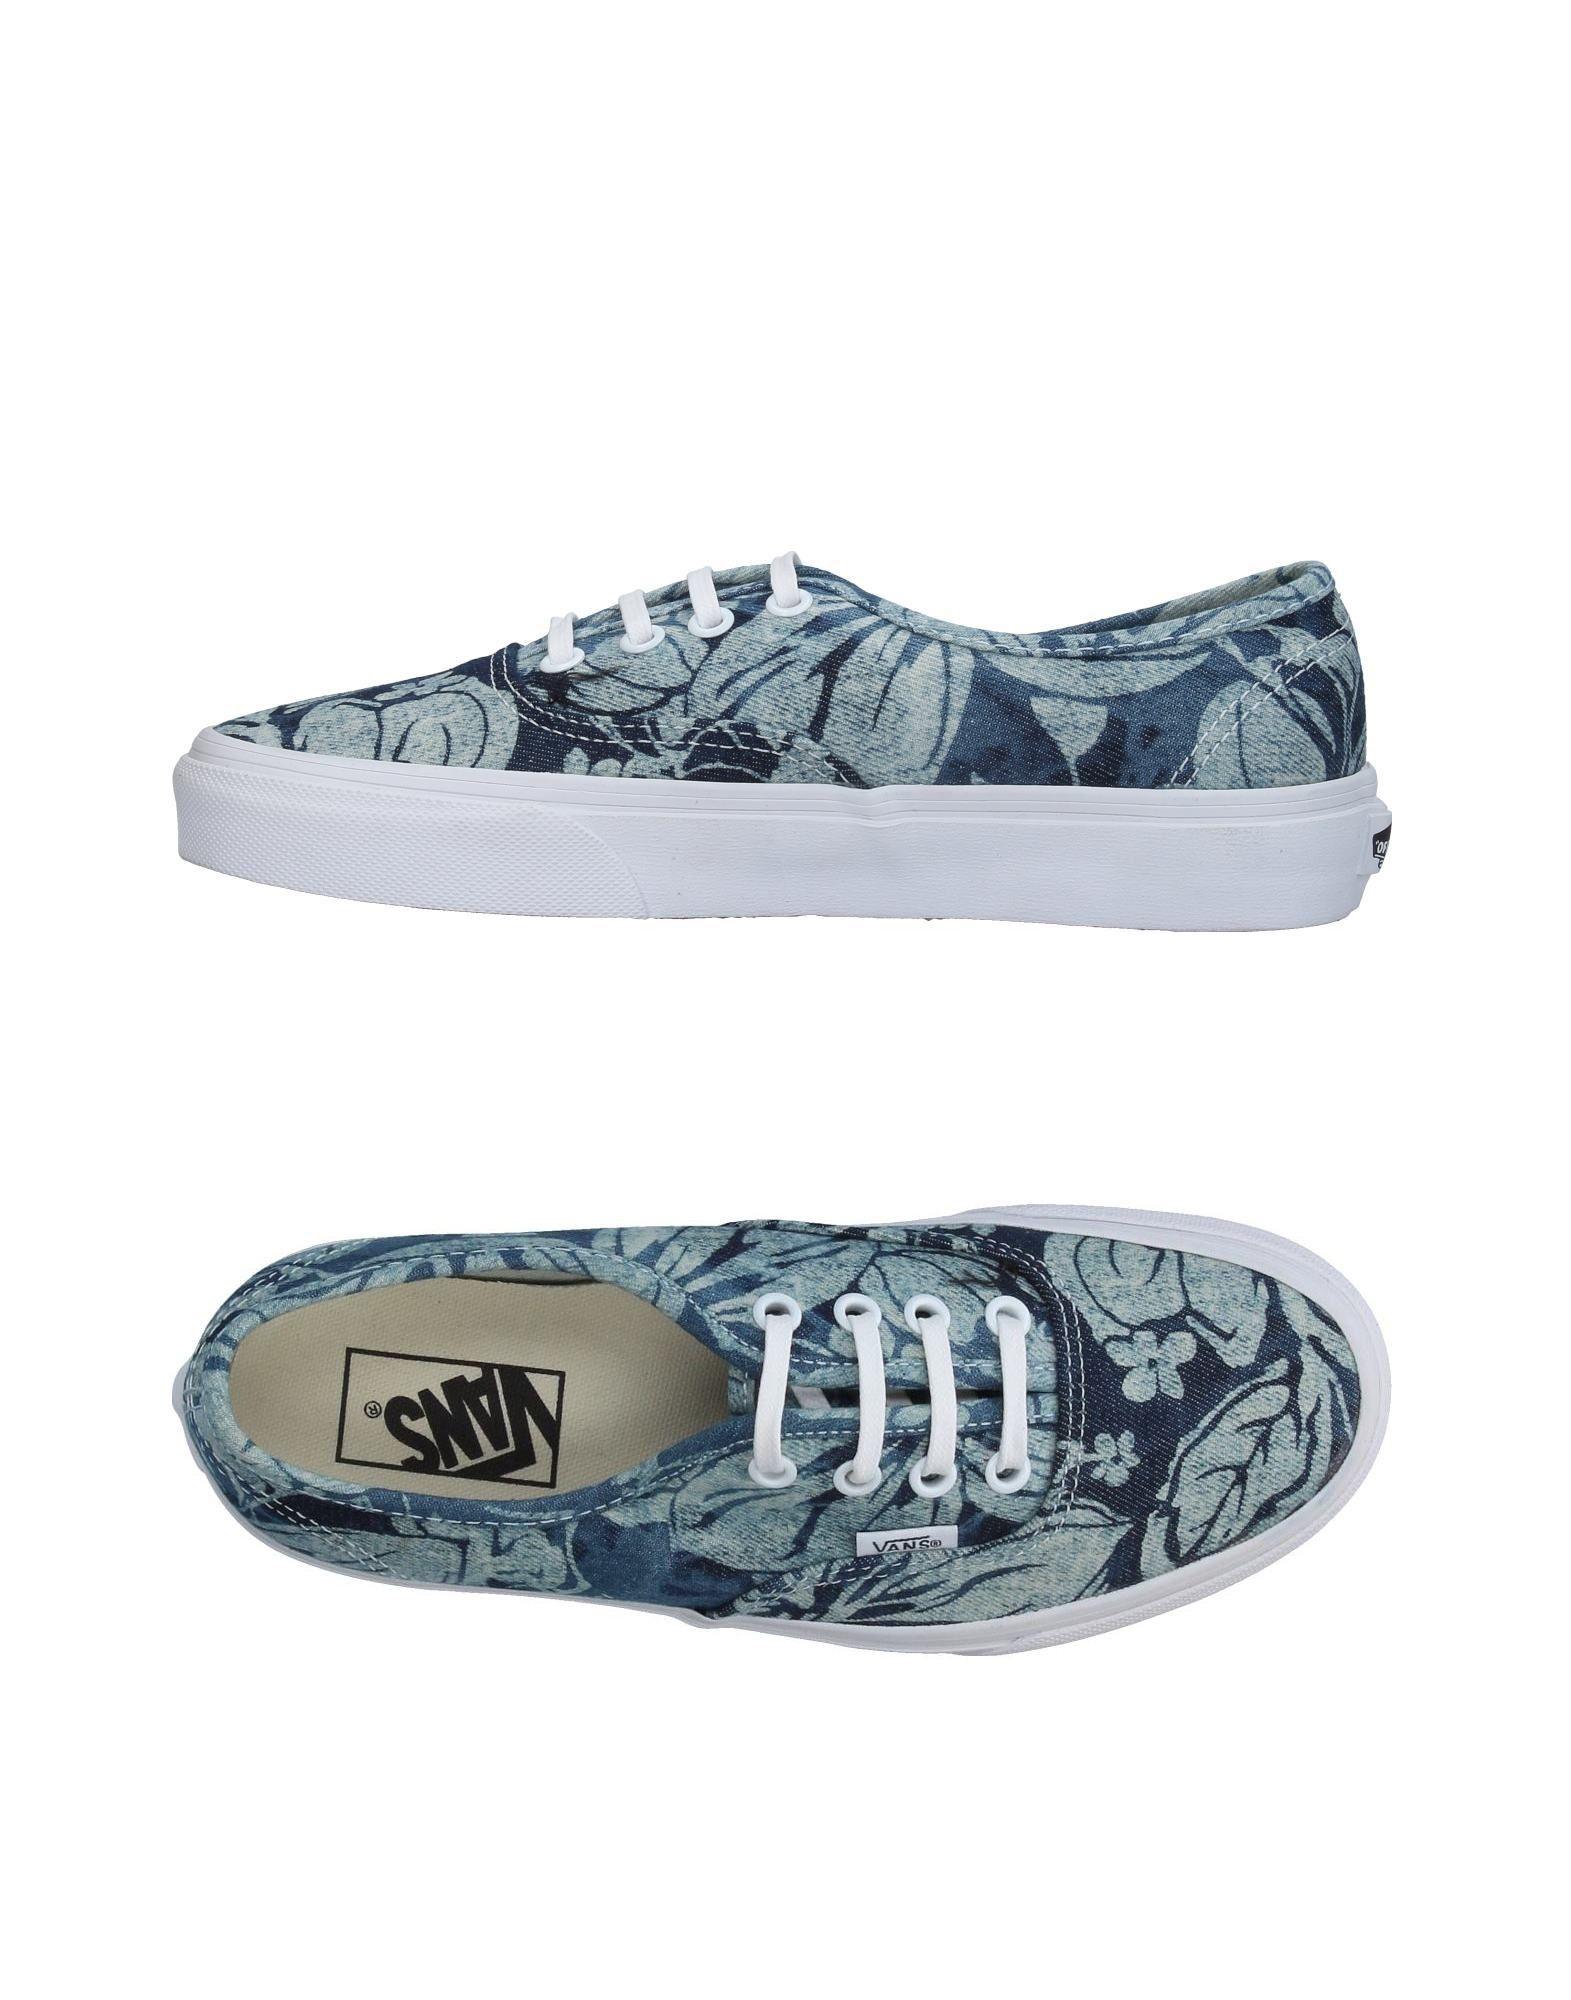 Vans Sneakers Damen  11314930EB Gute Qualität beliebte Schuhe